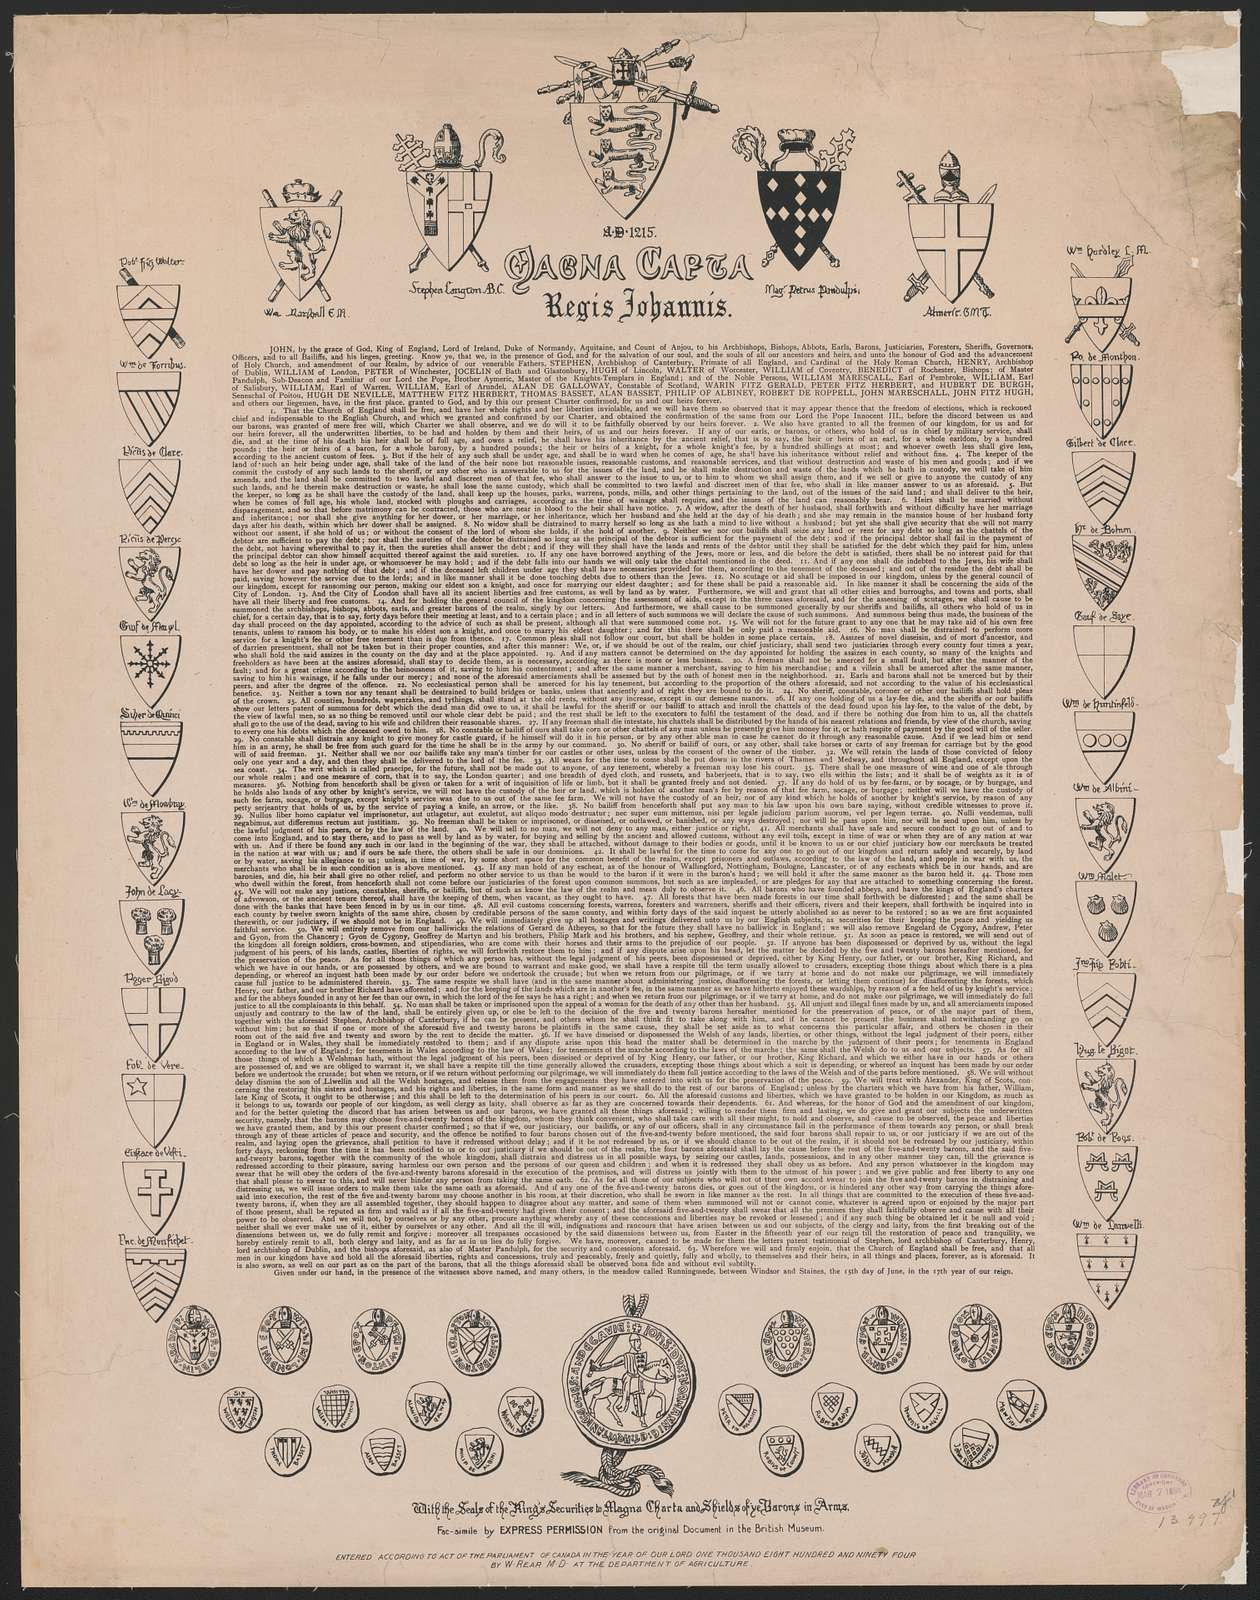 Magna Carta, regis johannis, AD 1215